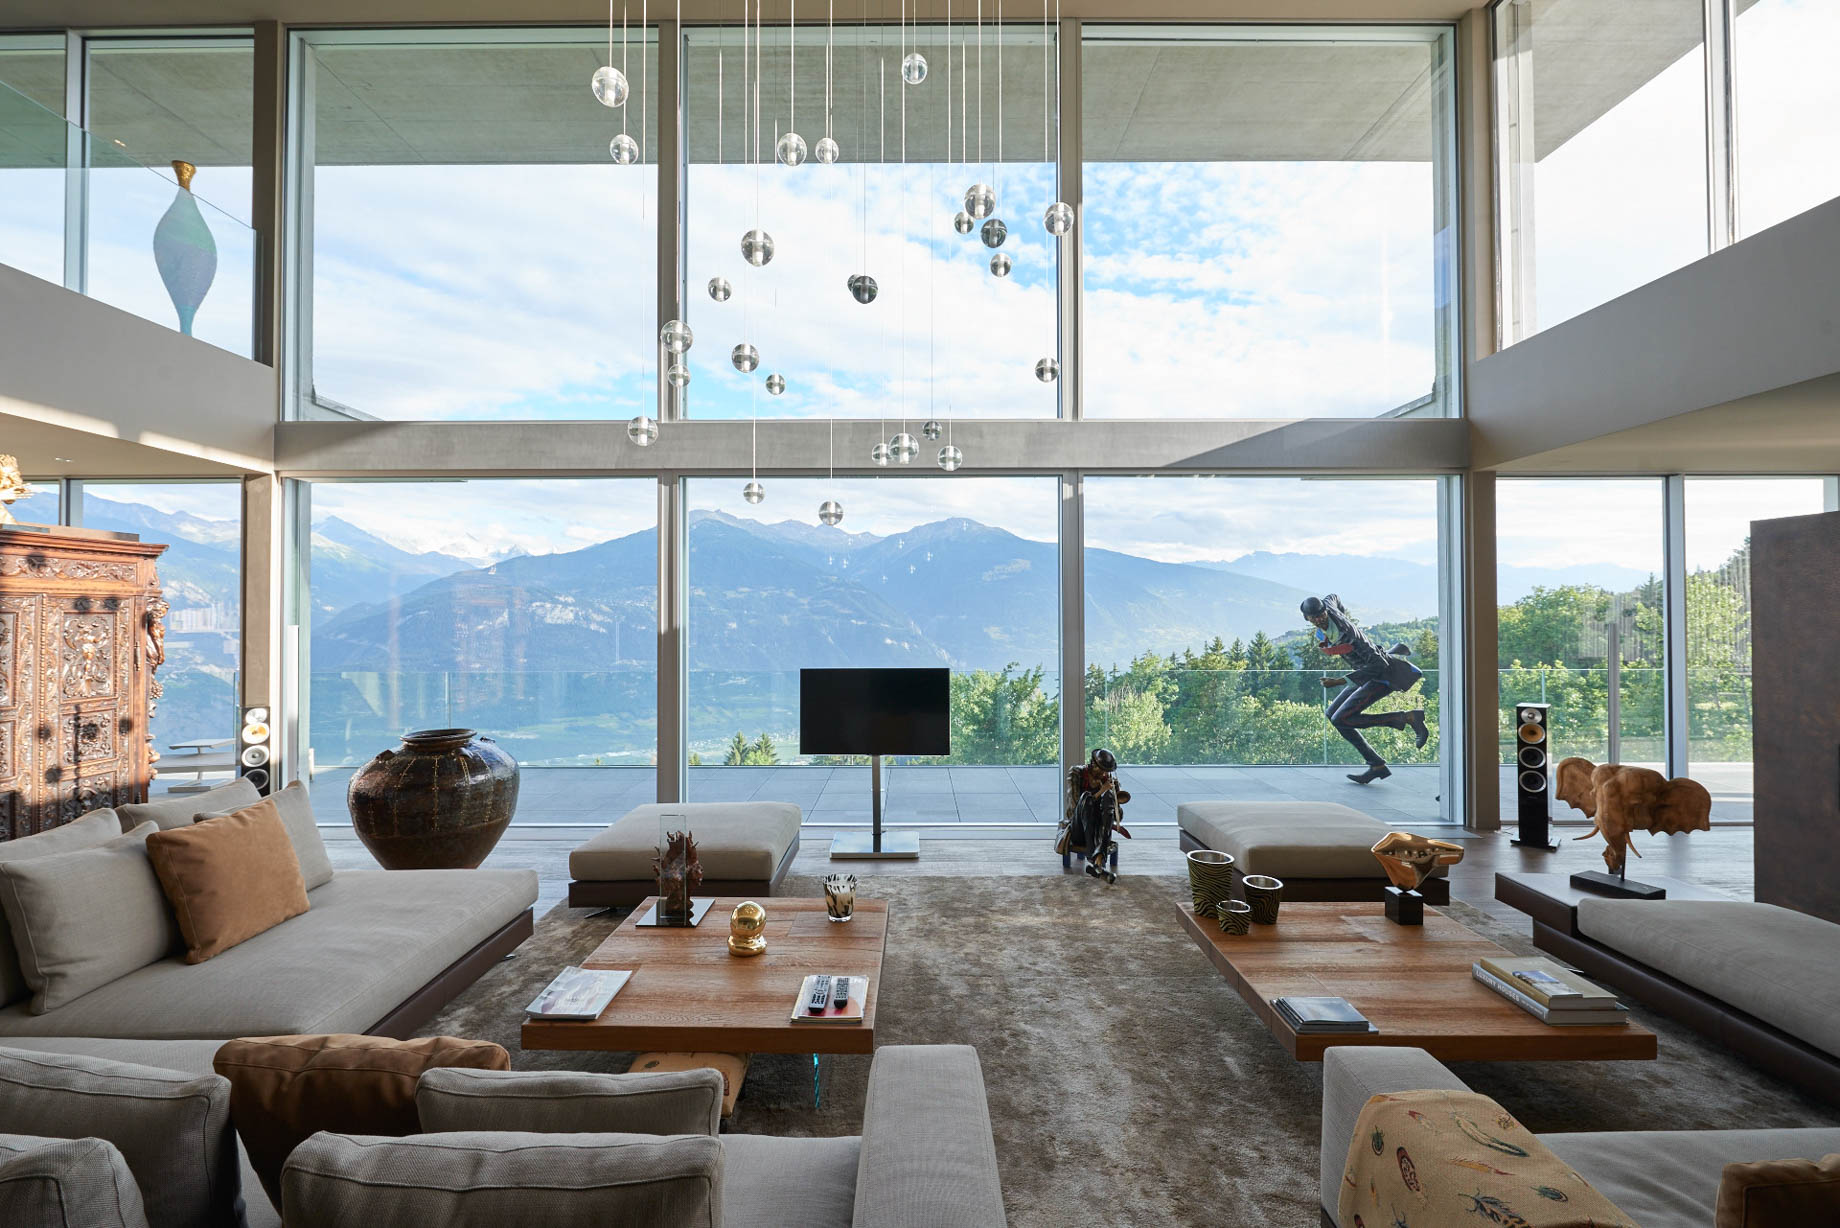 Mansion - Crans-Montana, Valais, Switzerland